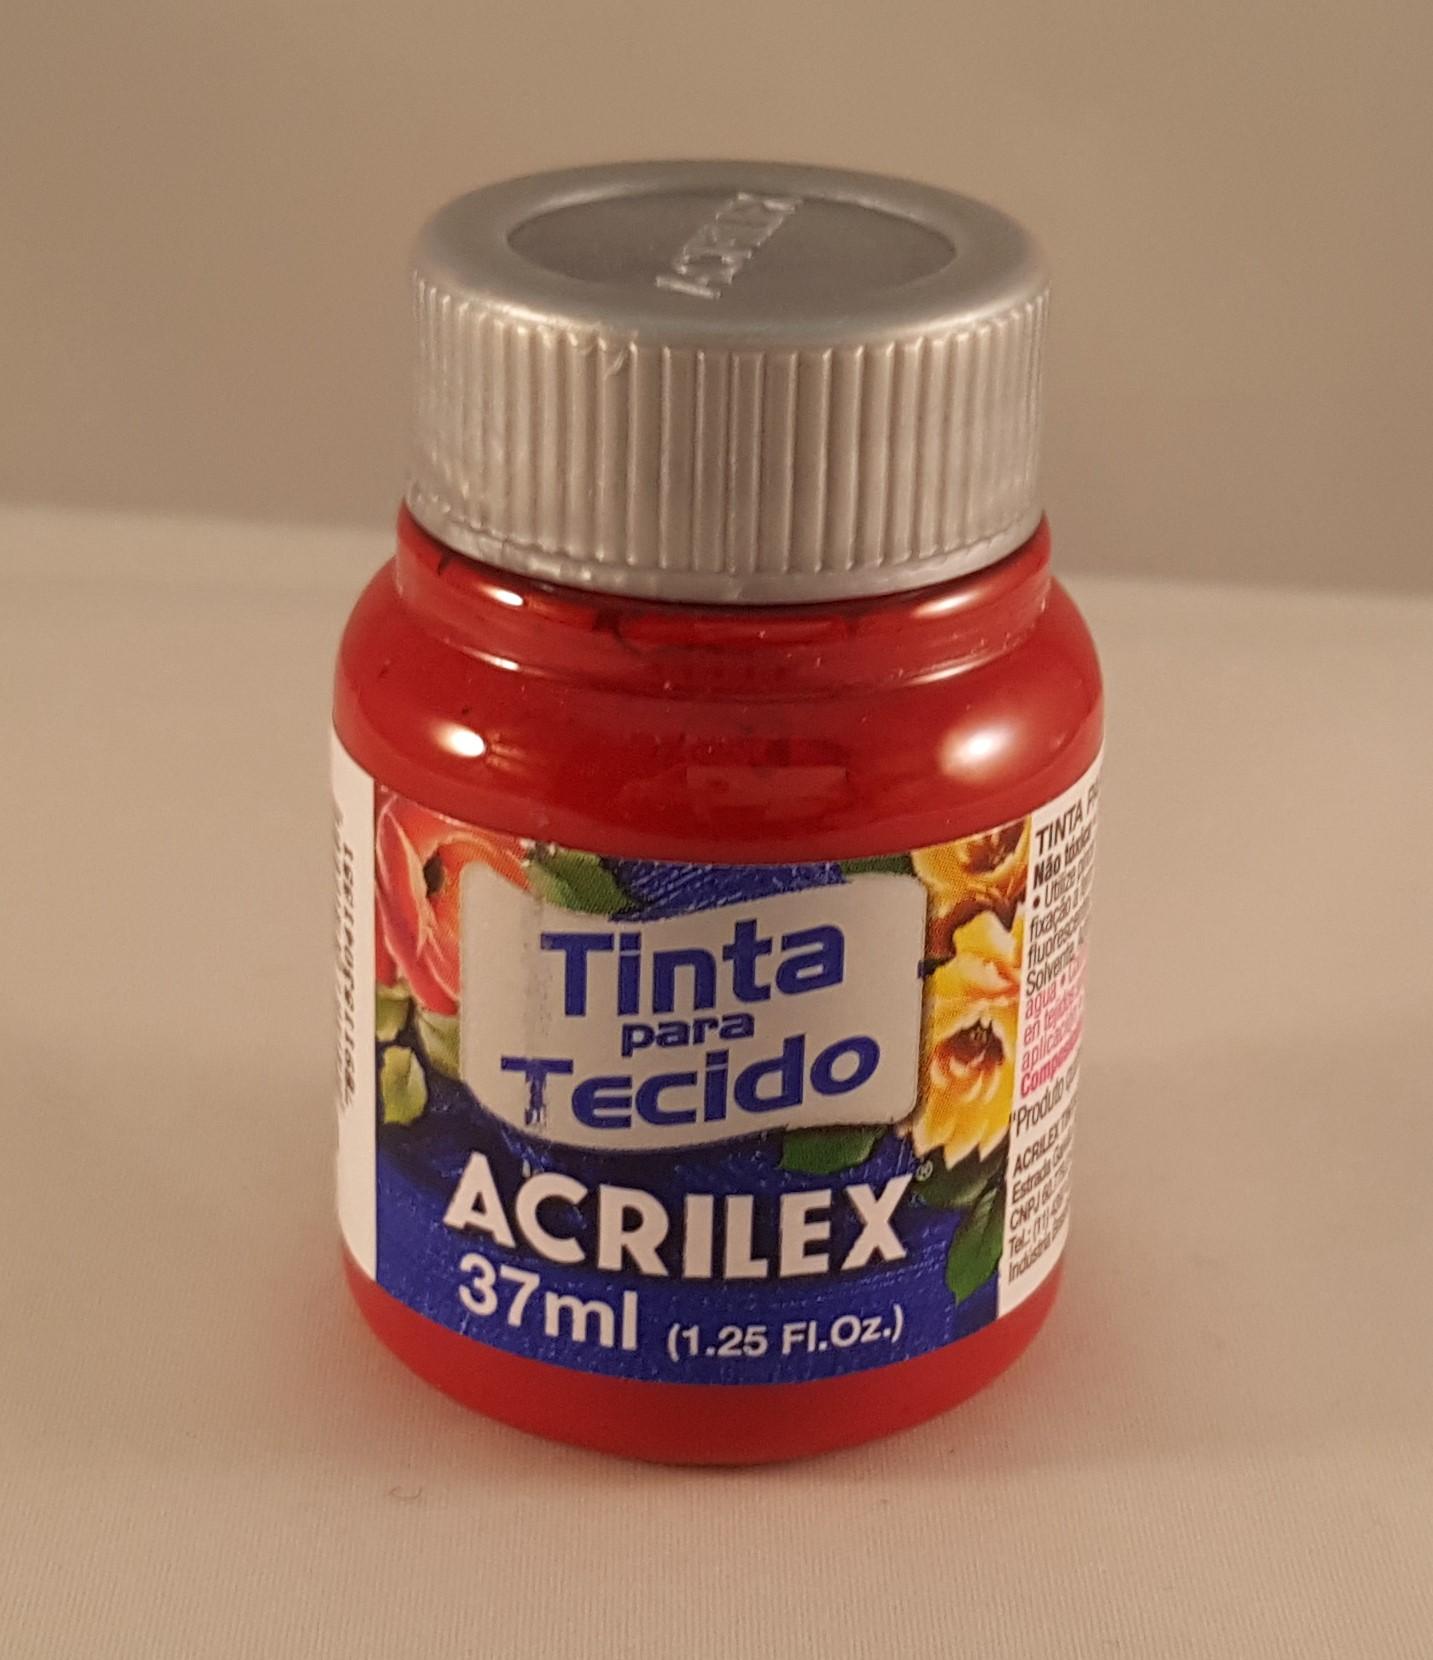 Tinta Tecido Acrilex púrpura 550